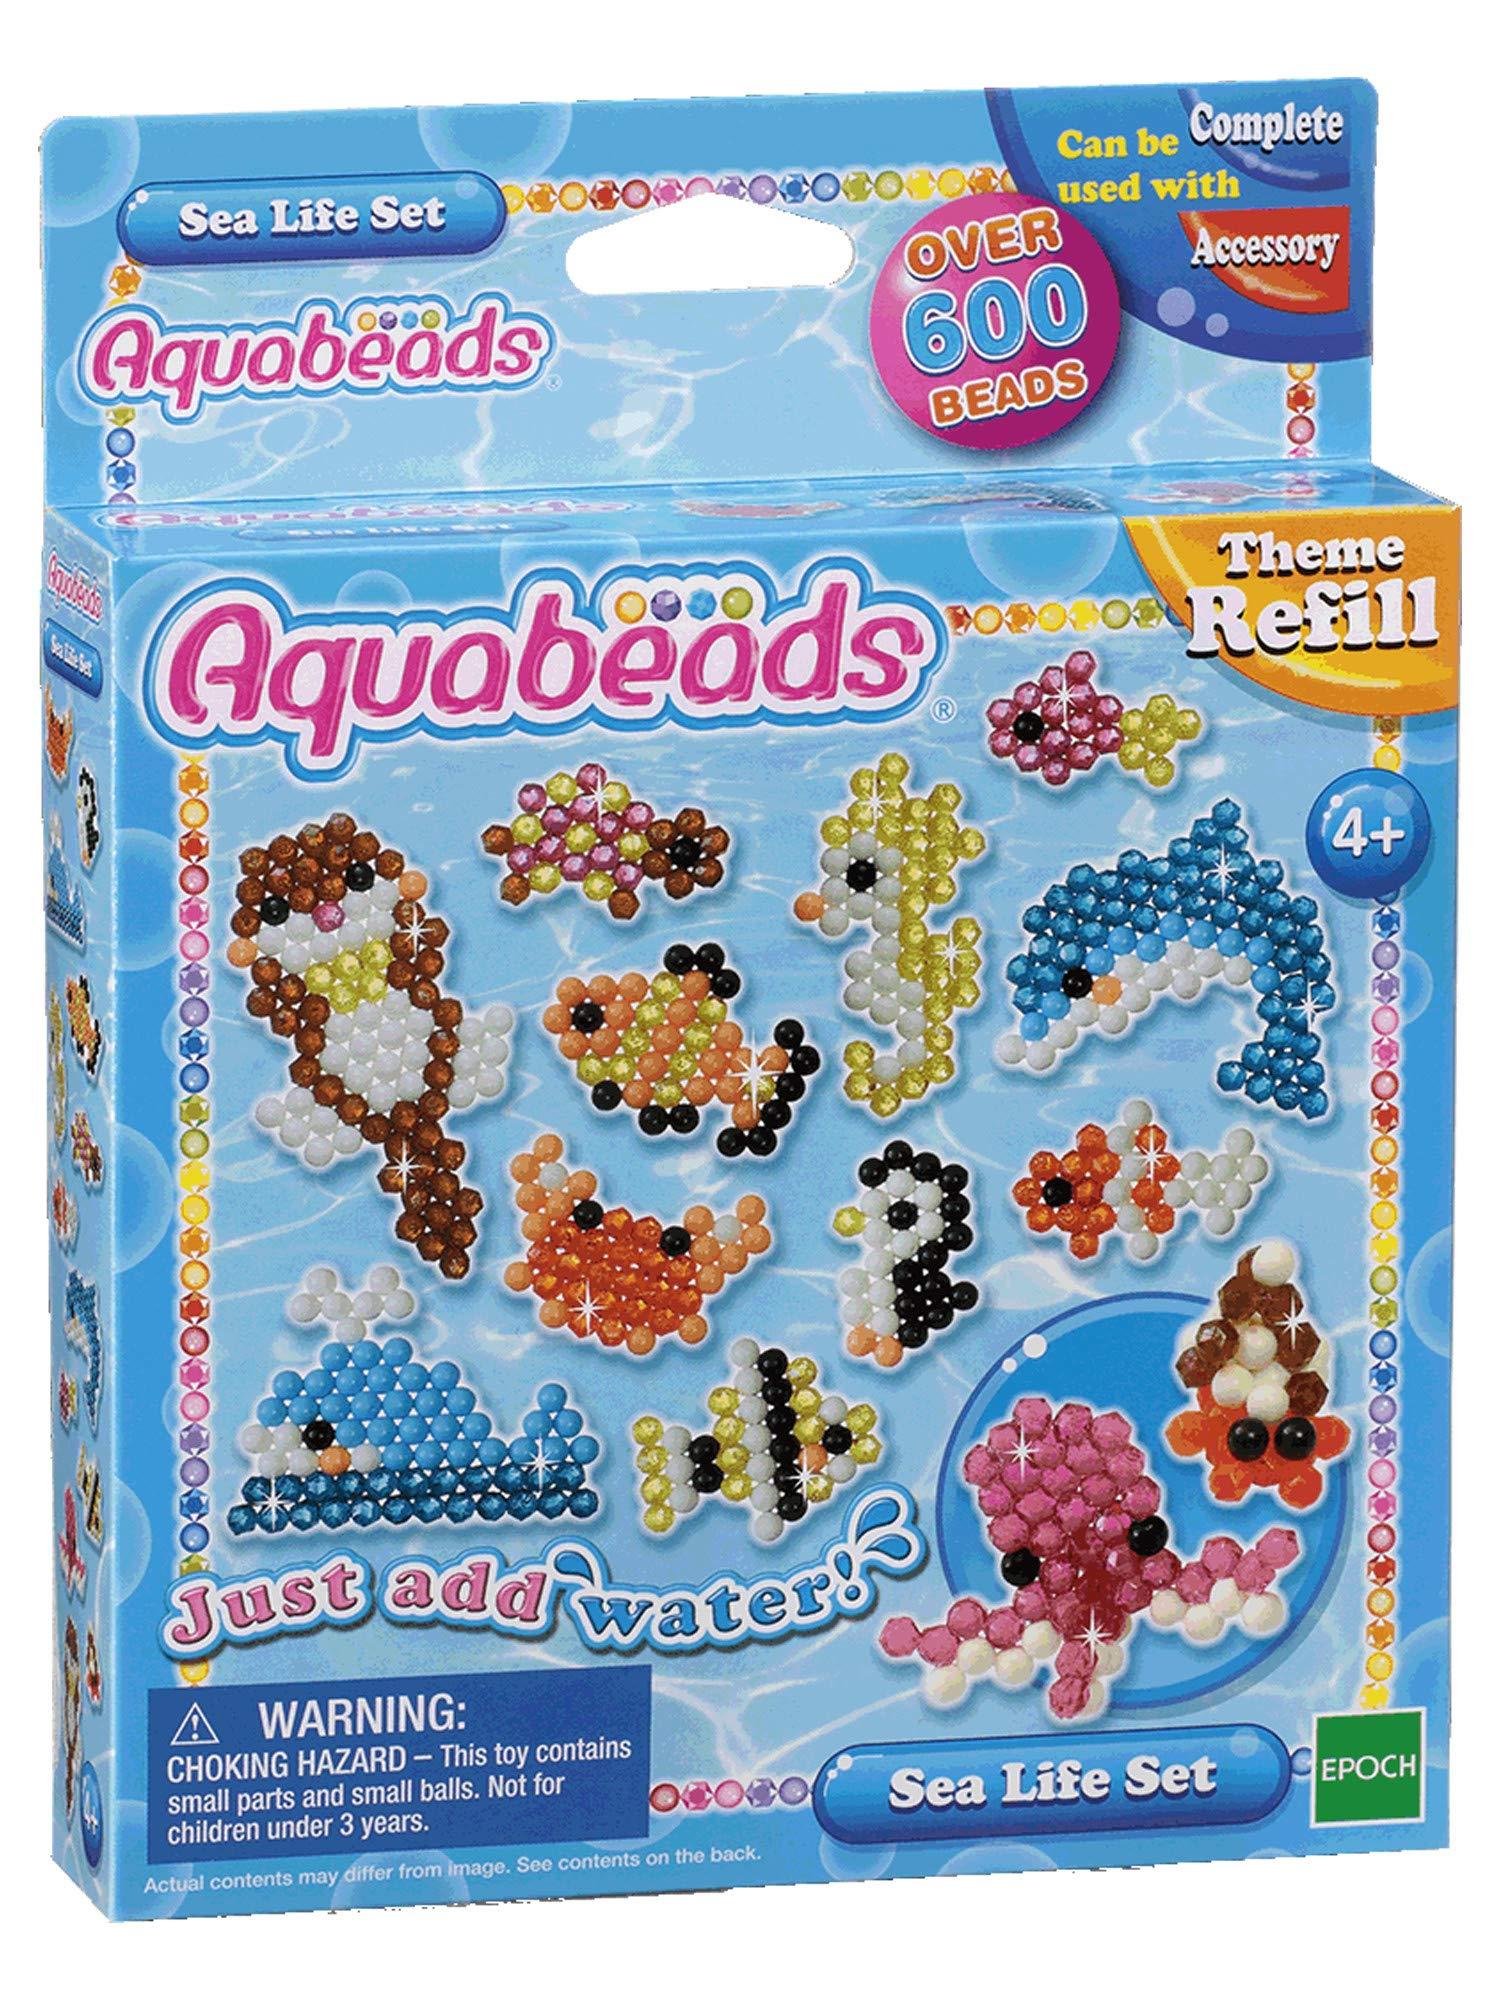 Aquabeads Theme Pack, Craft Sets